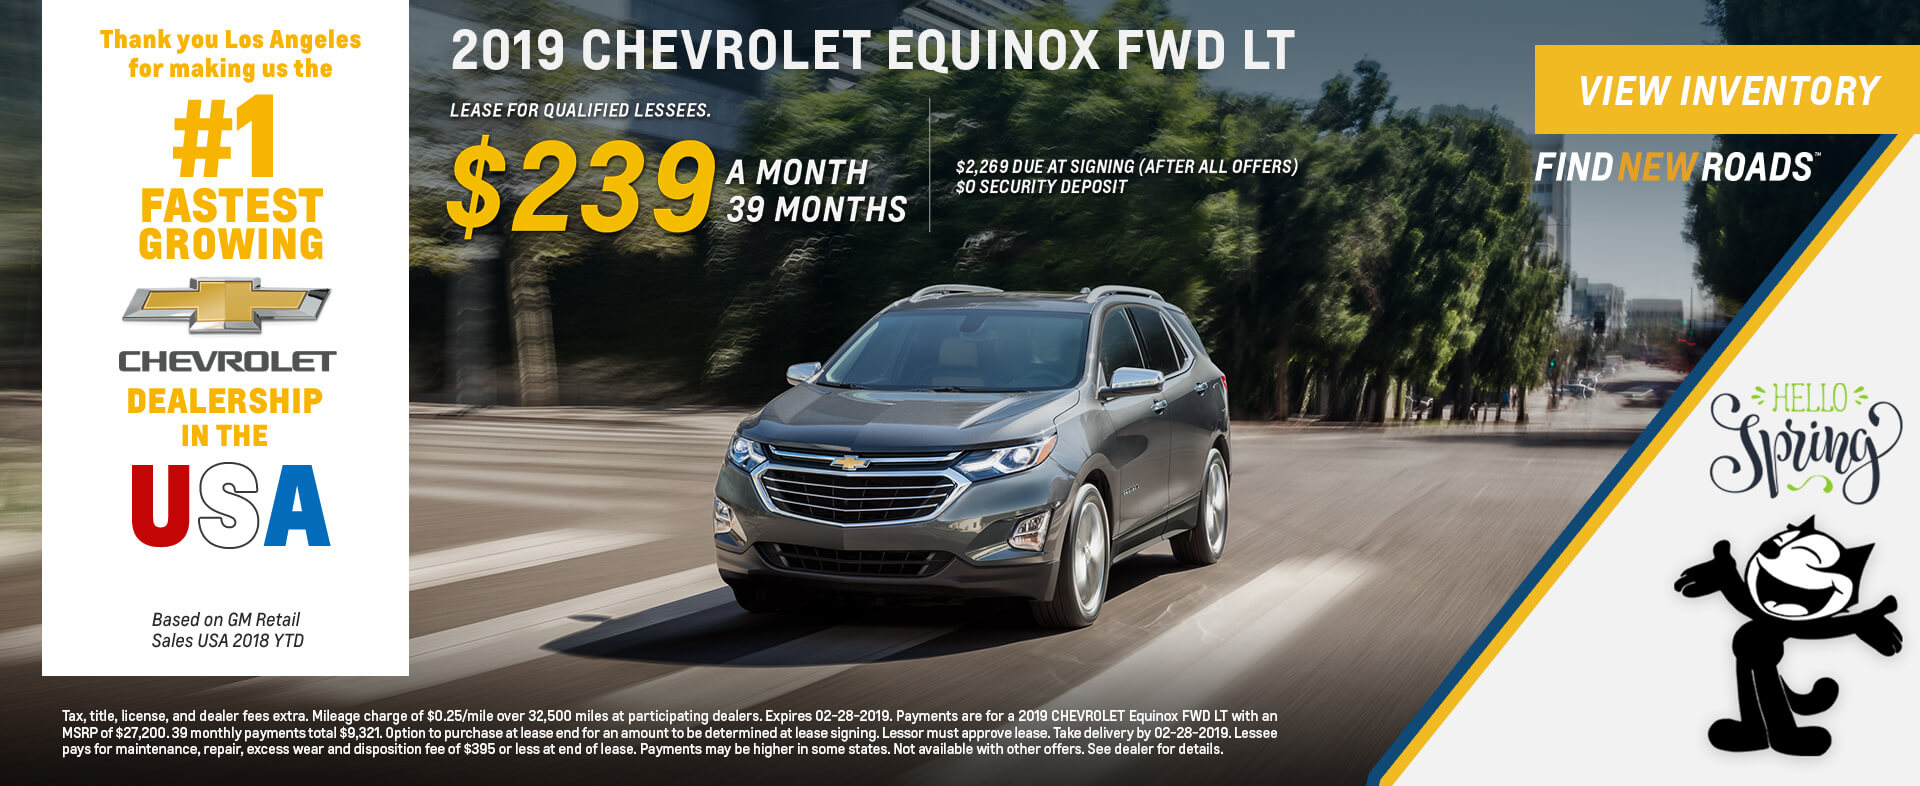 New & Used Chevrolet Dealer - Los Angeles, Glendale, Pasadena & Carson -  Felix Chevrolet